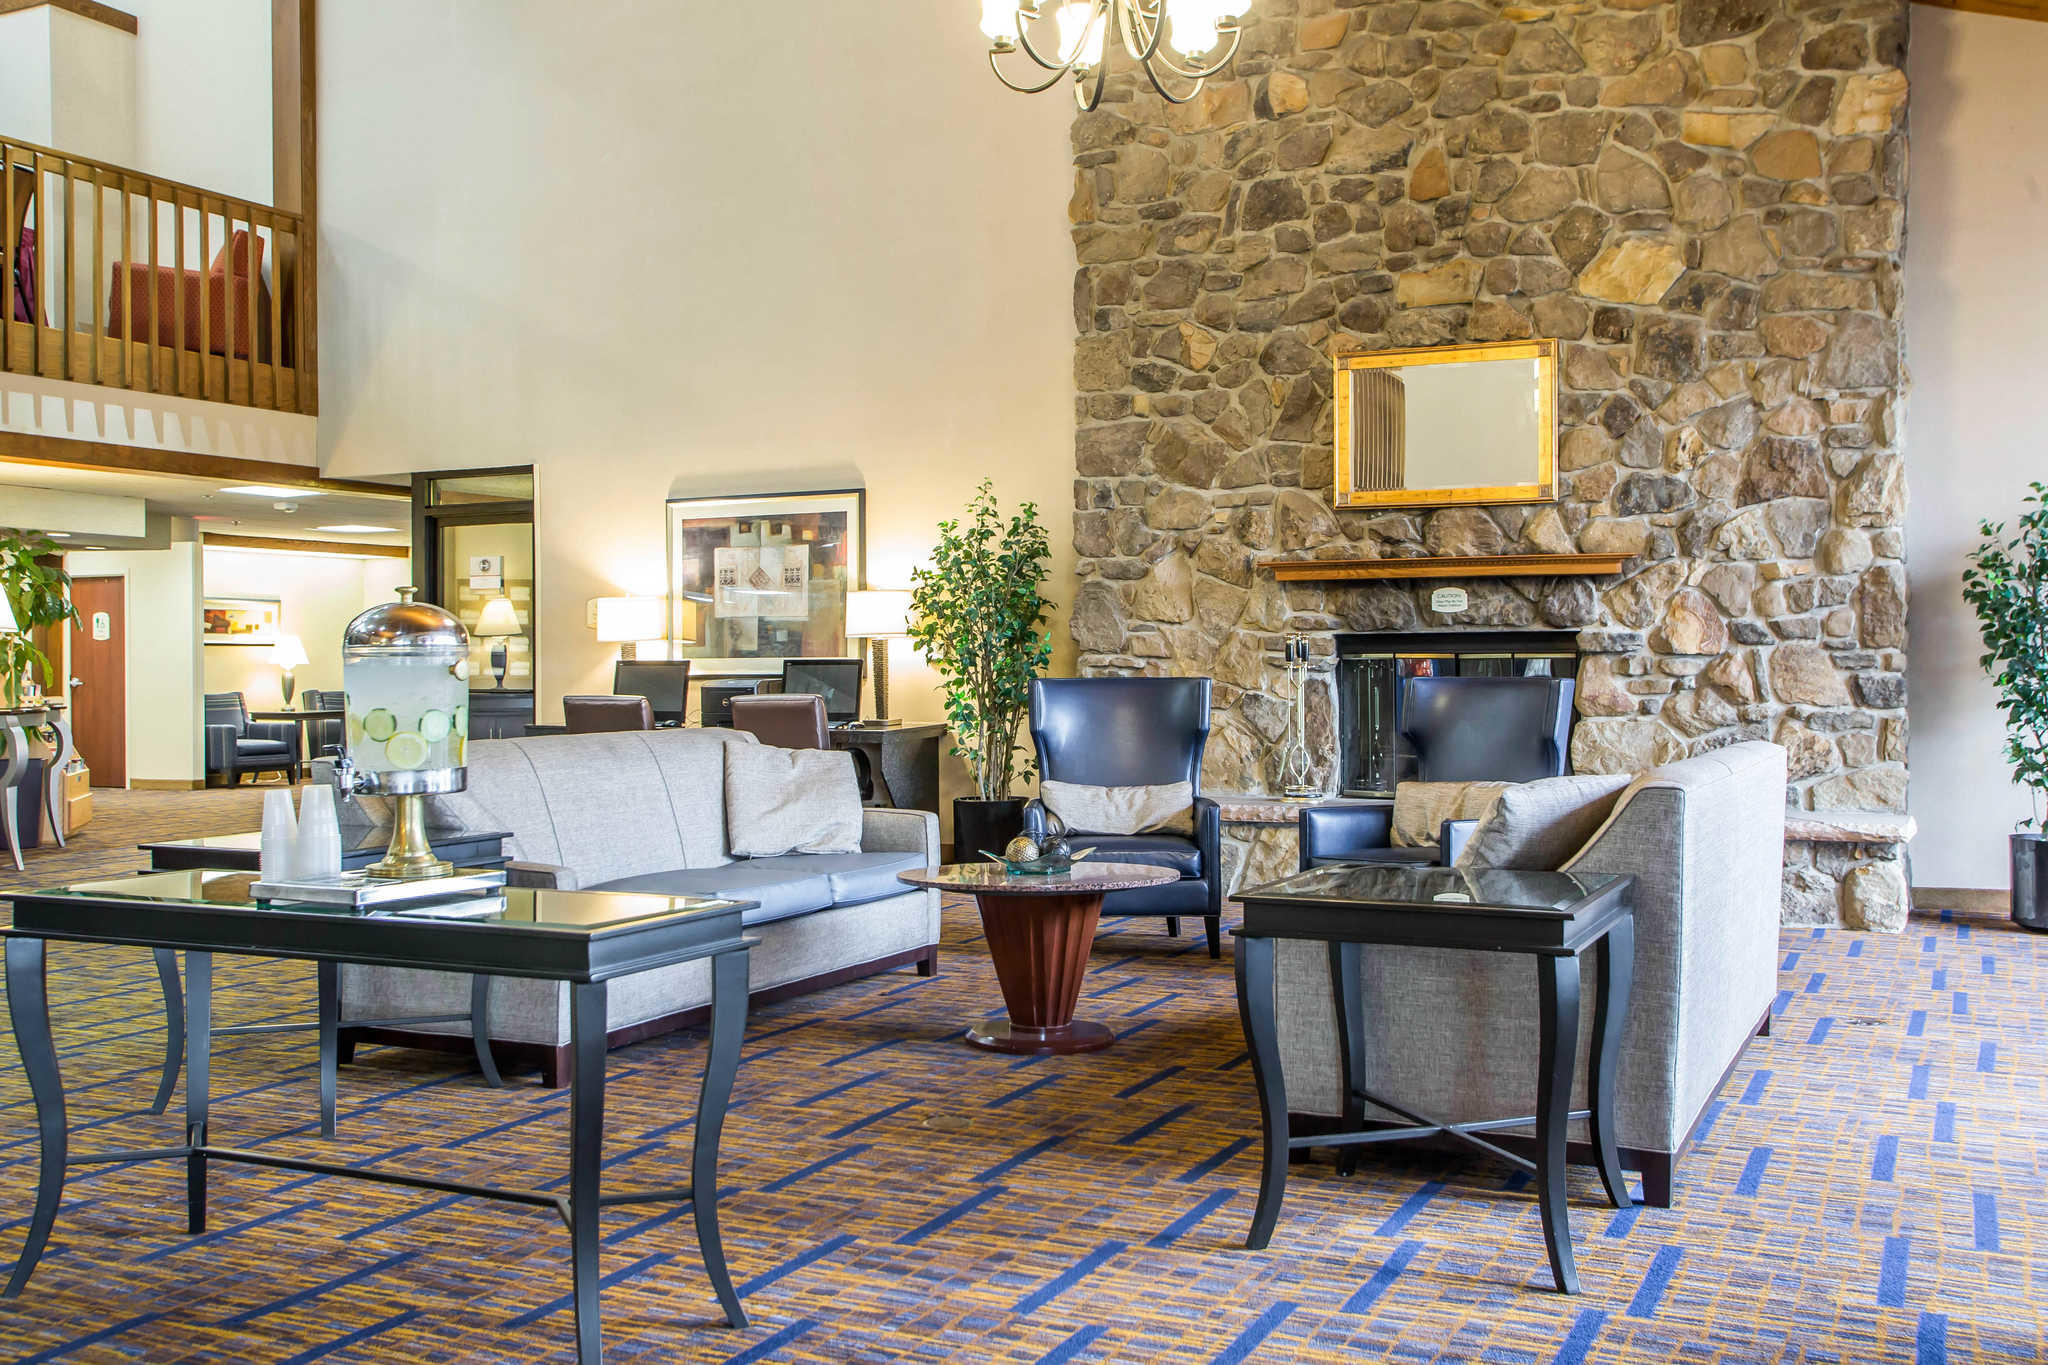 Clarion Inn image 4